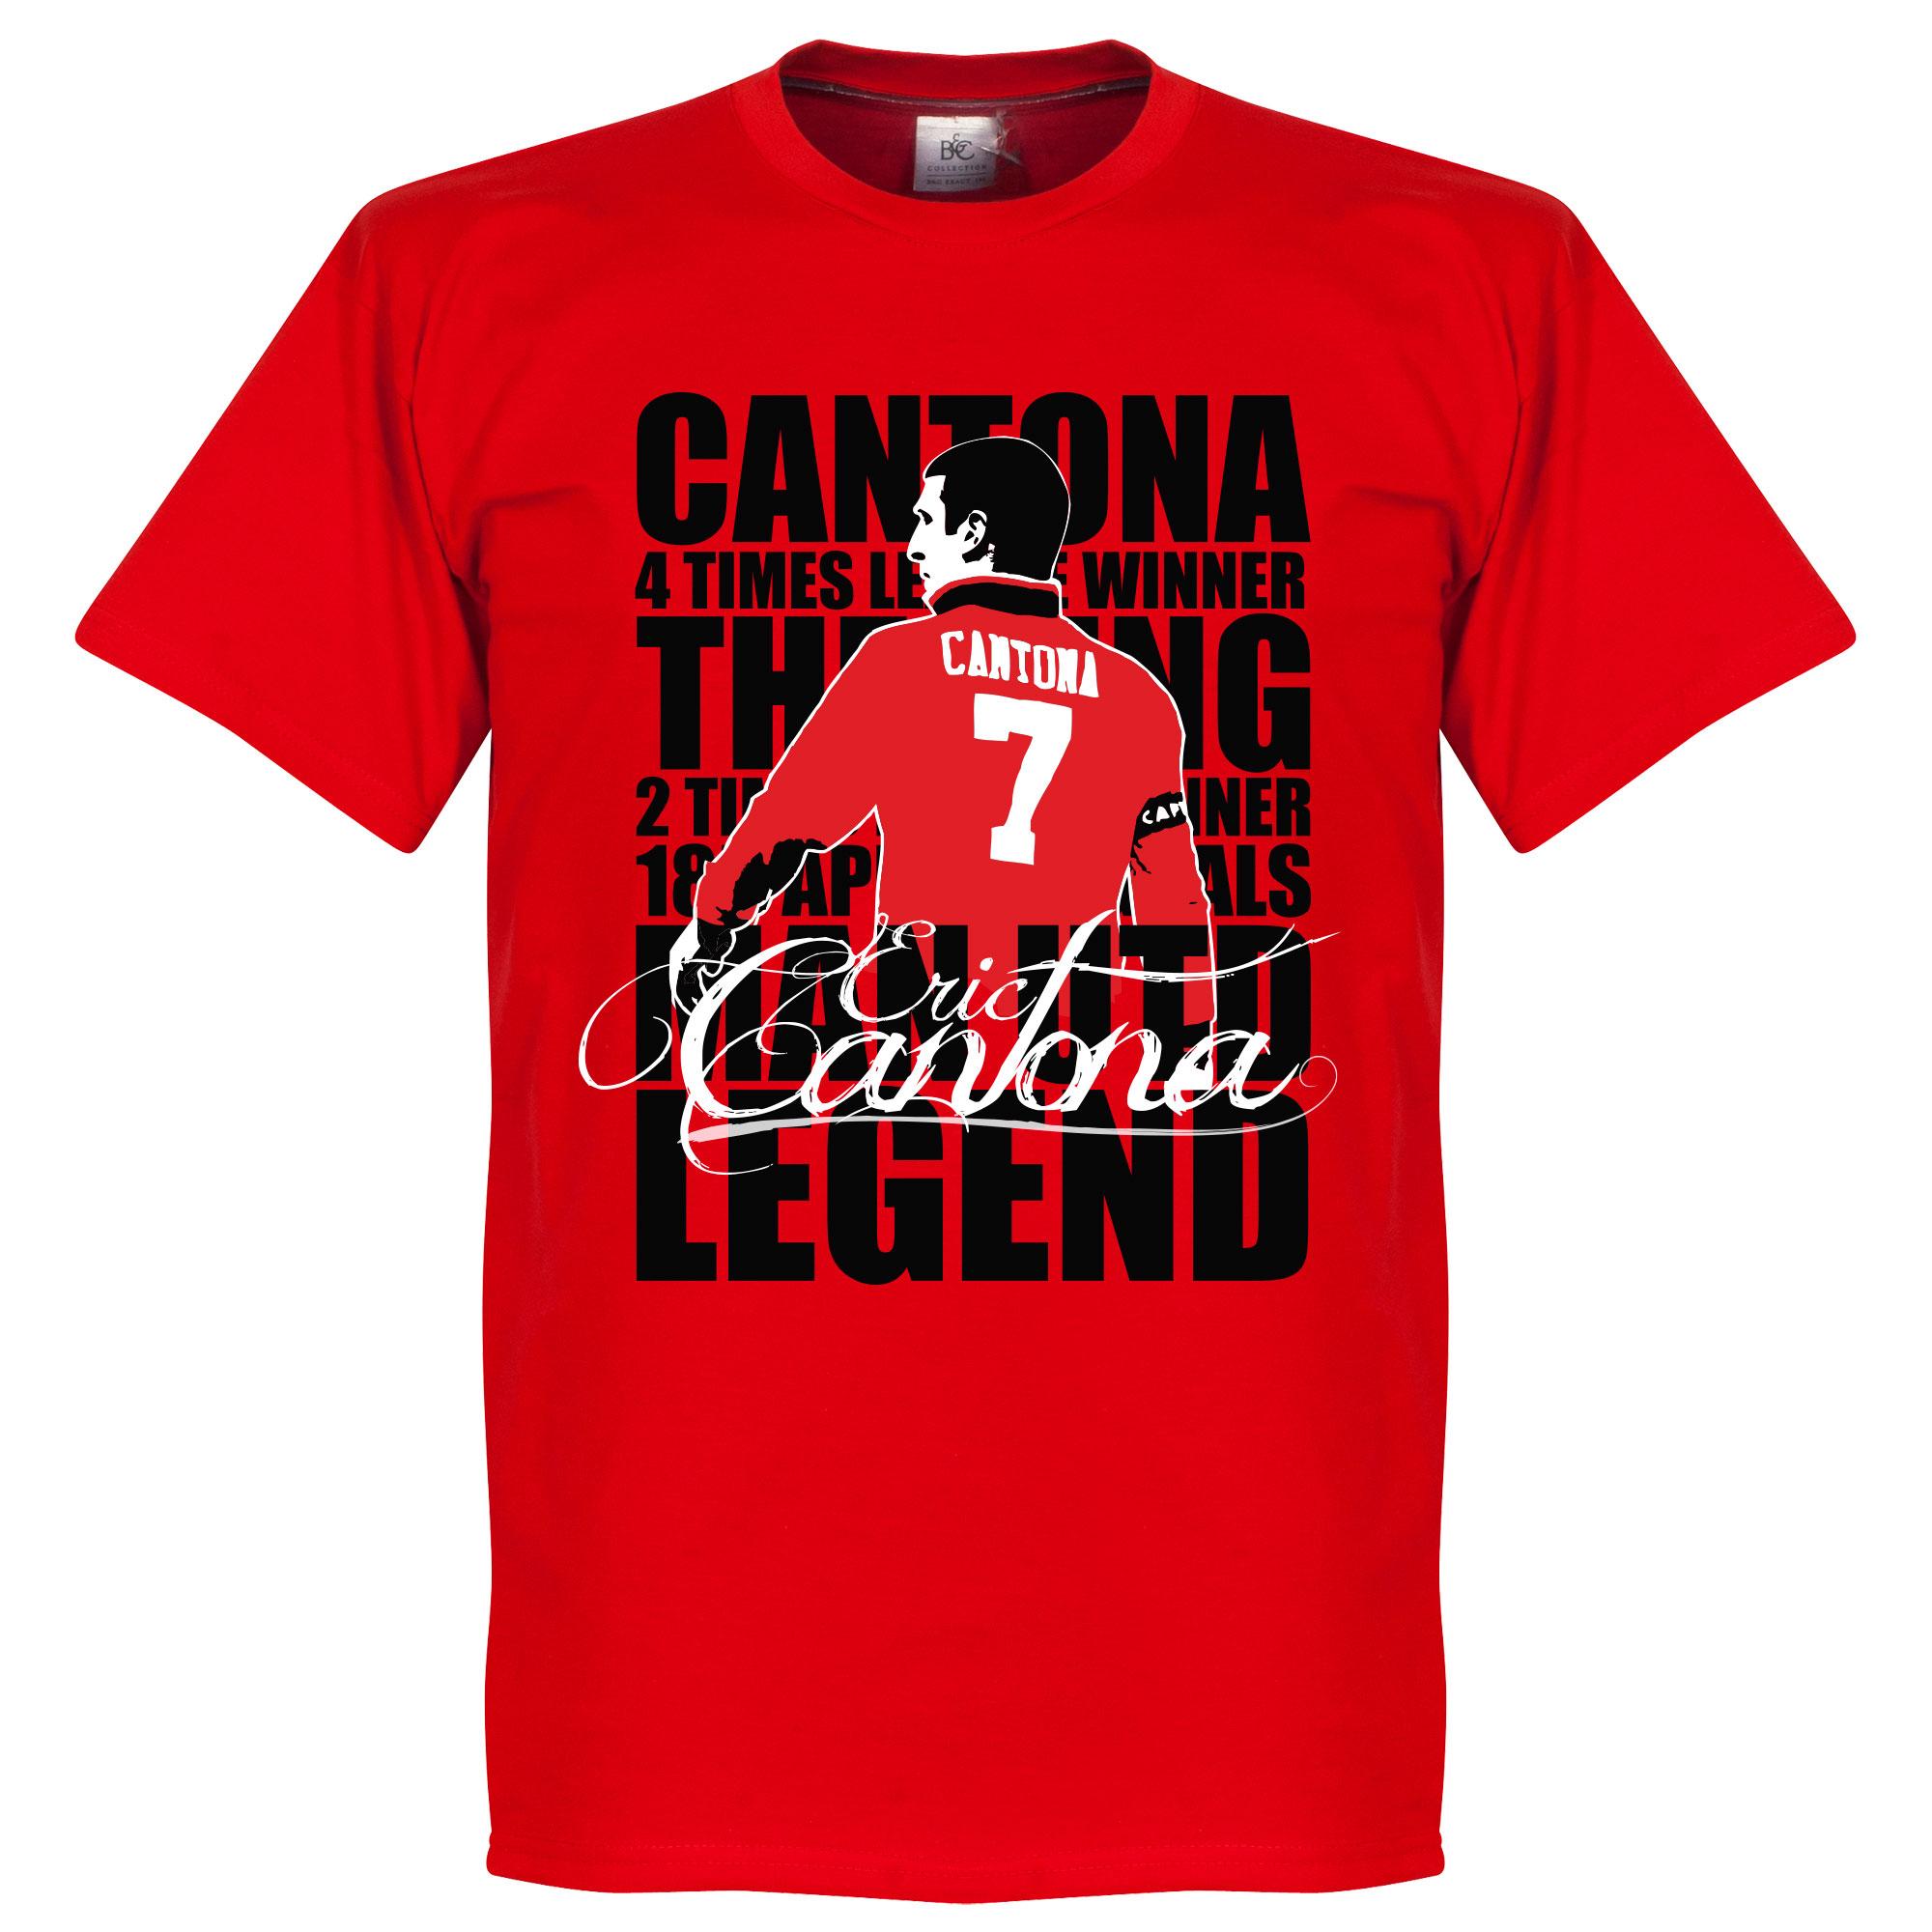 Eric Cantona Legend Tee - Red - S